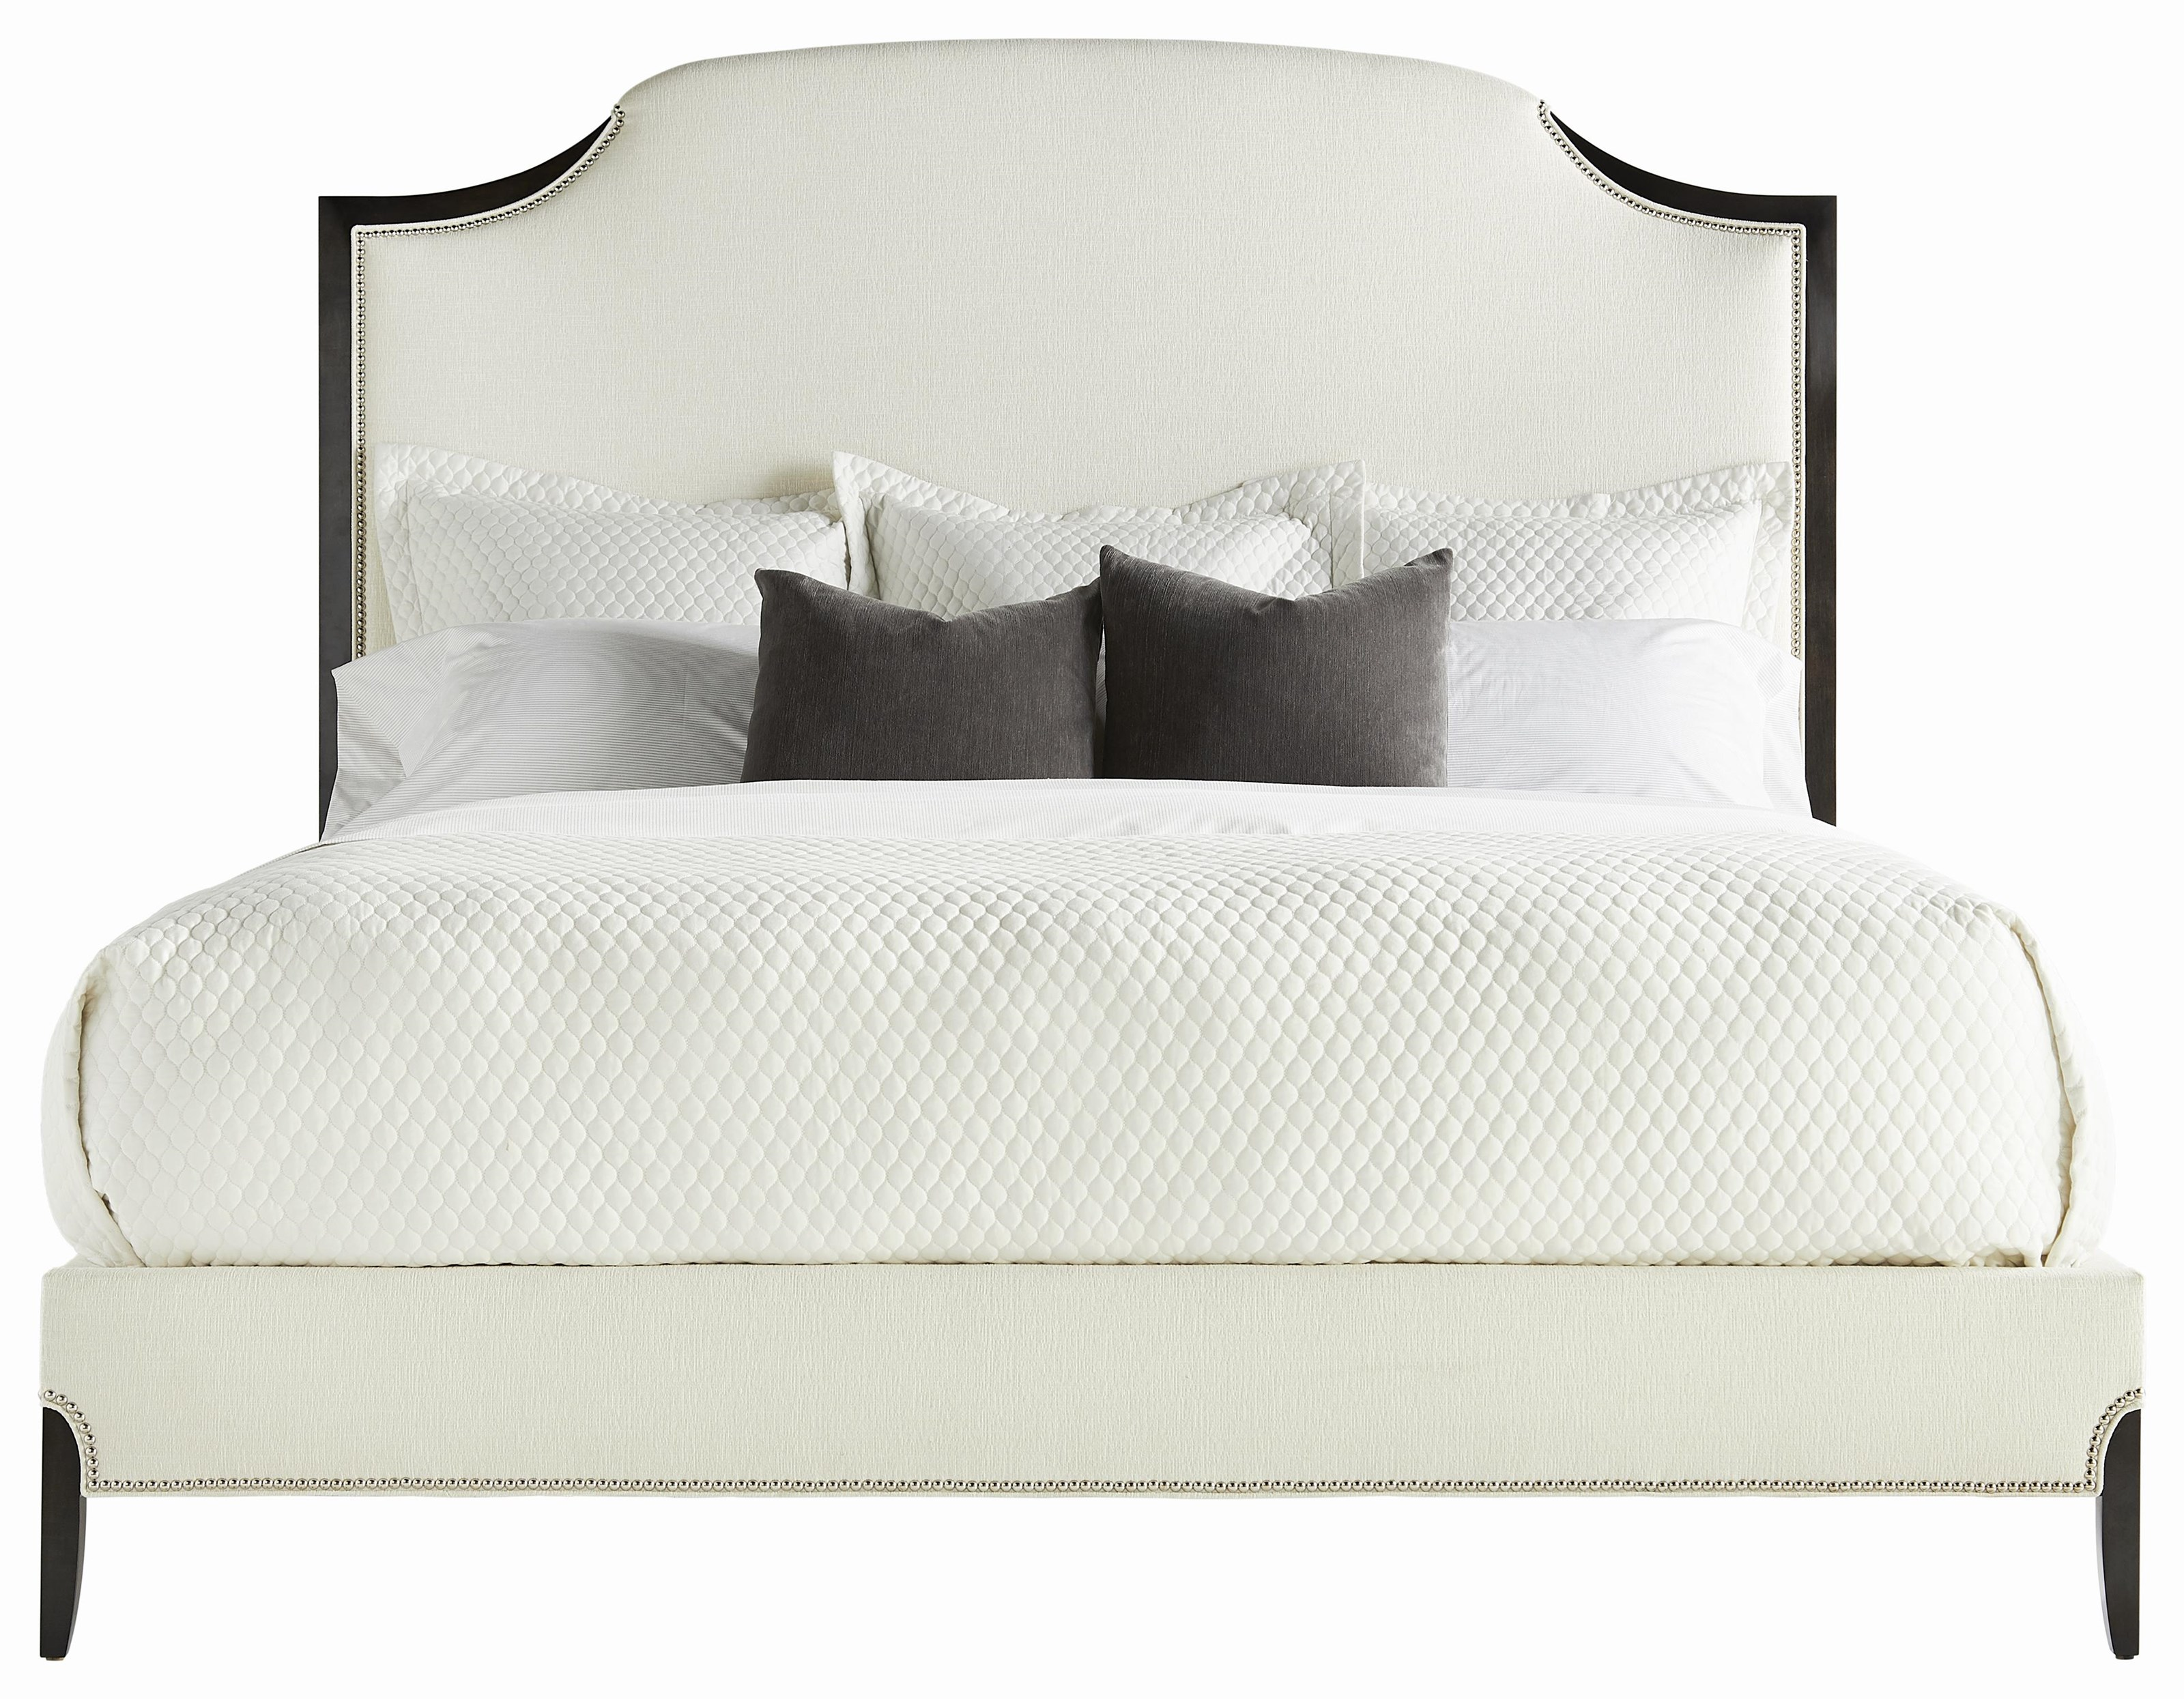 Lillet Queen Bed by Vanguard Furniture at Belfort Furniture